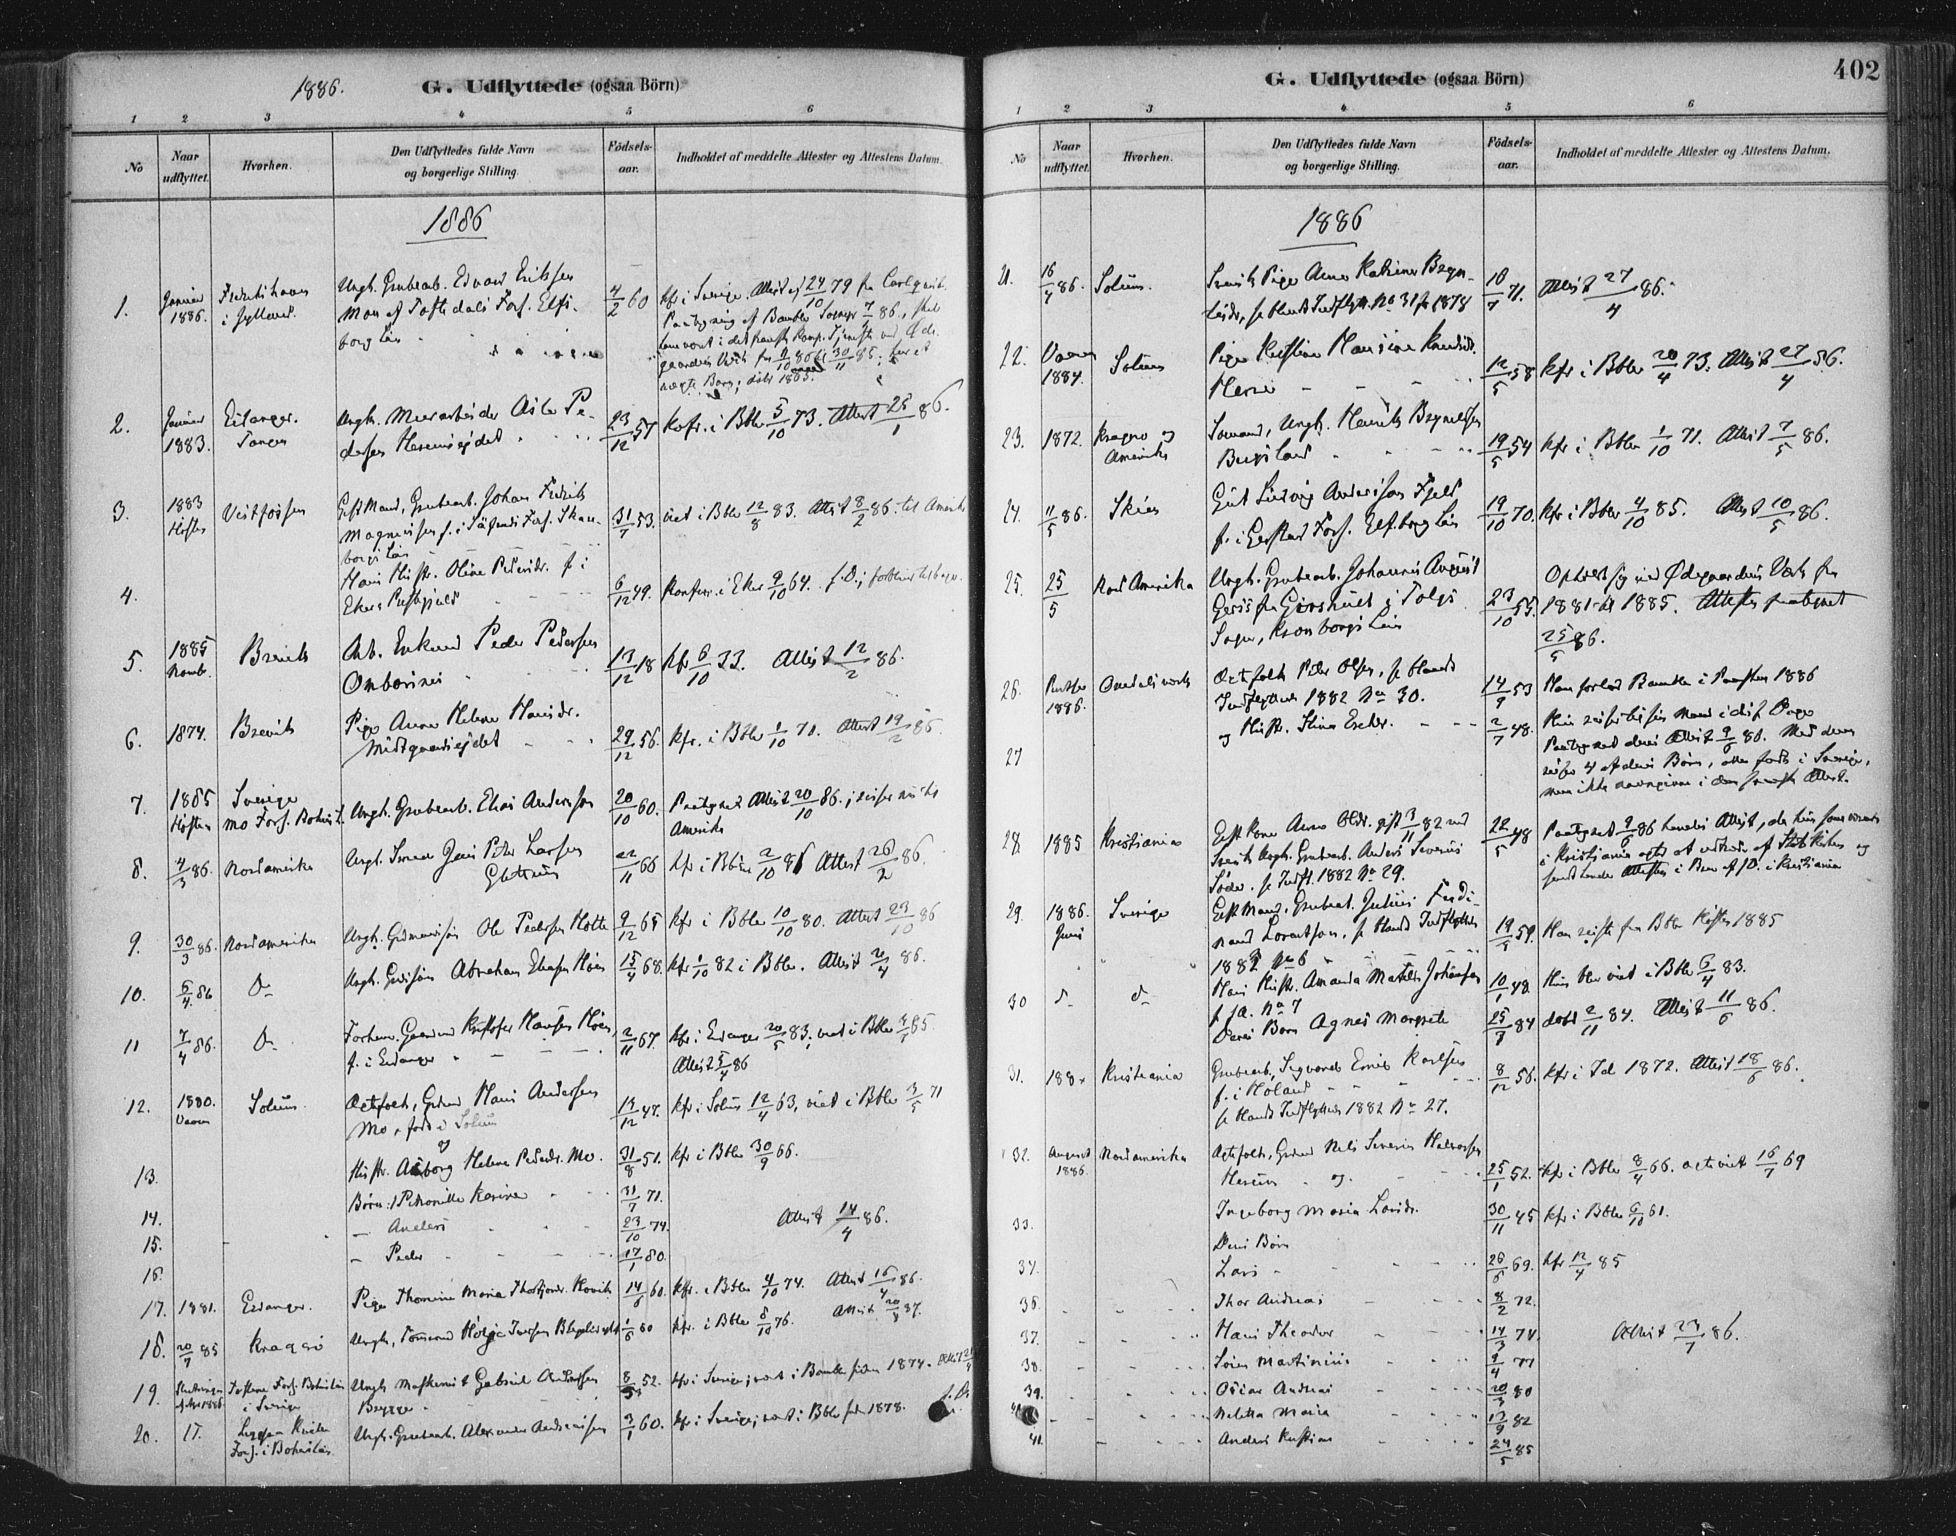 SAKO, Bamble kirkebøker, F/Fa/L0007: Ministerialbok nr. I 7, 1878-1888, s. 402